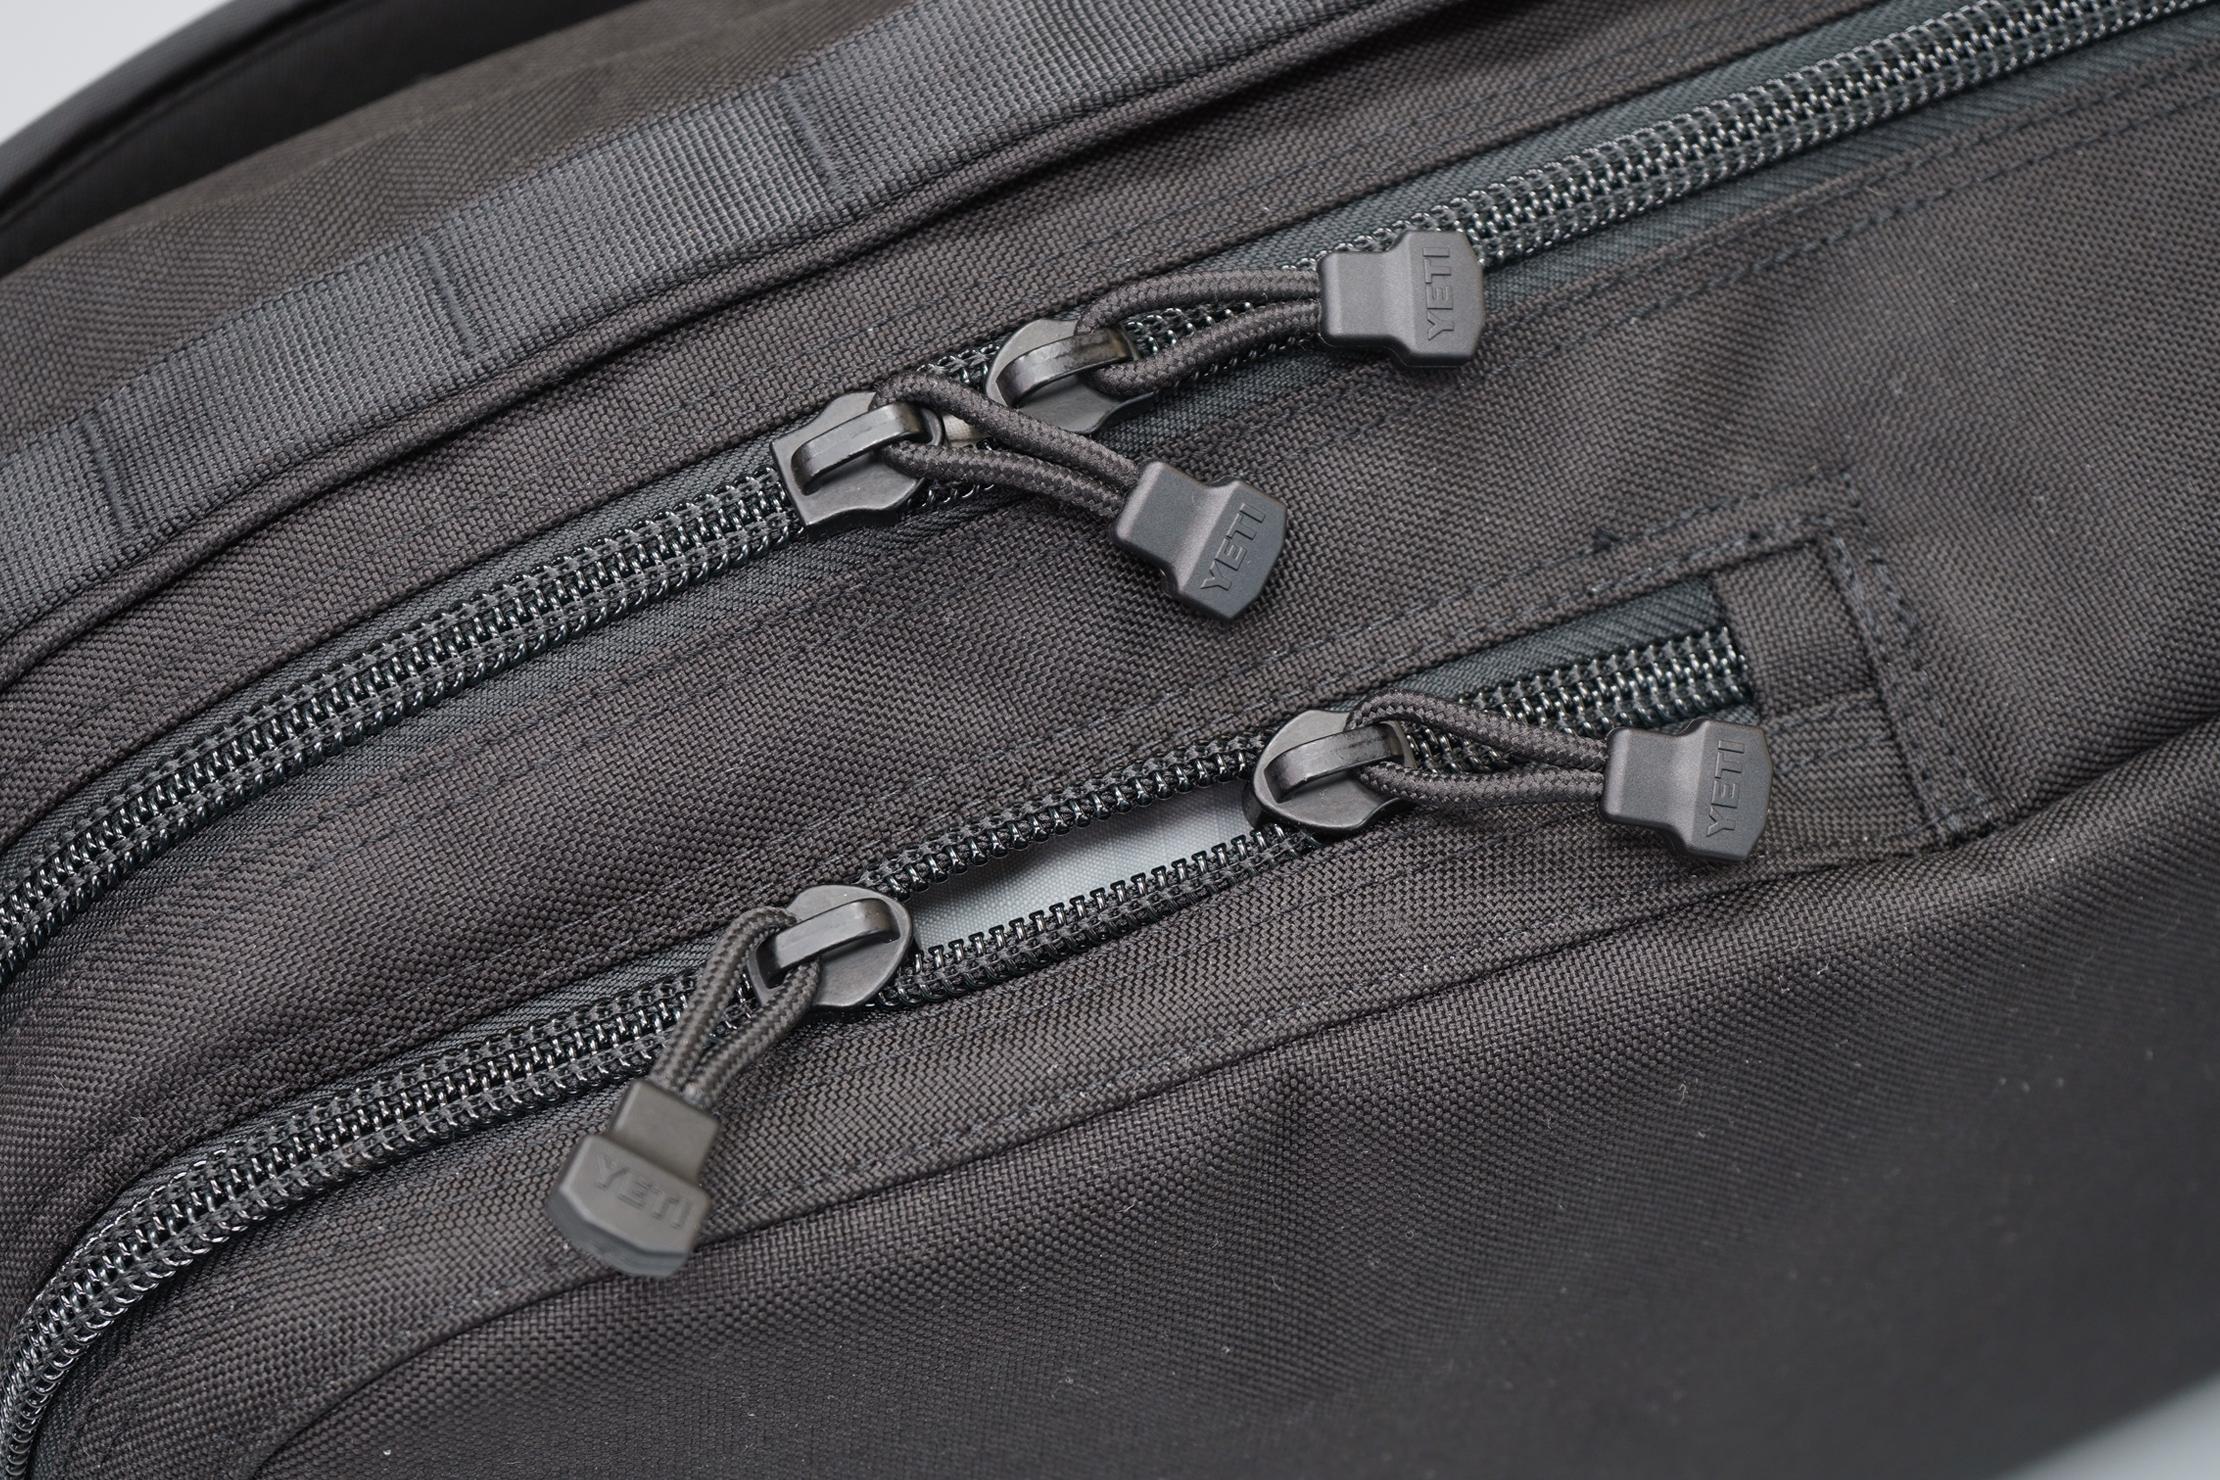 YETI Tocayo YKK Zippers